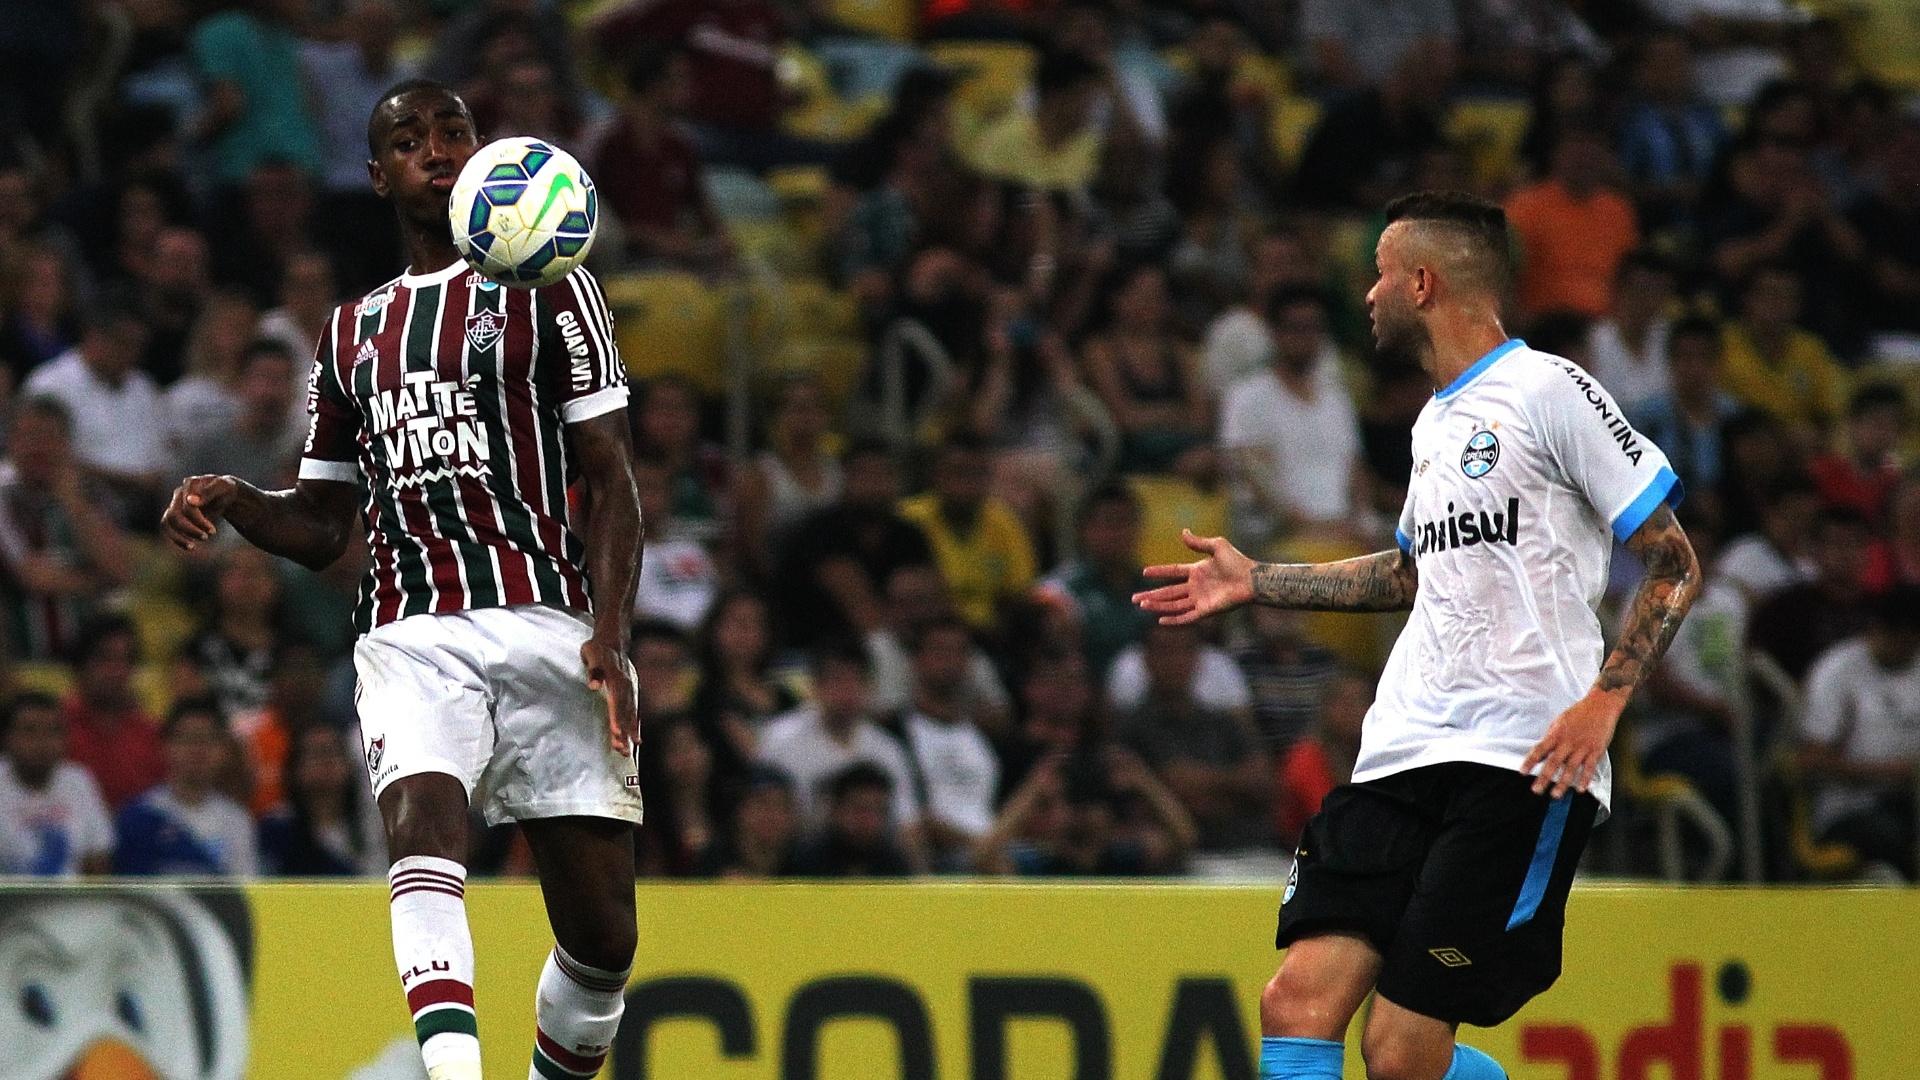 Gérson domina a bola enquanto é observado por Luan no duelo entre Fluminense e Grêmio pela Copa do Brasil